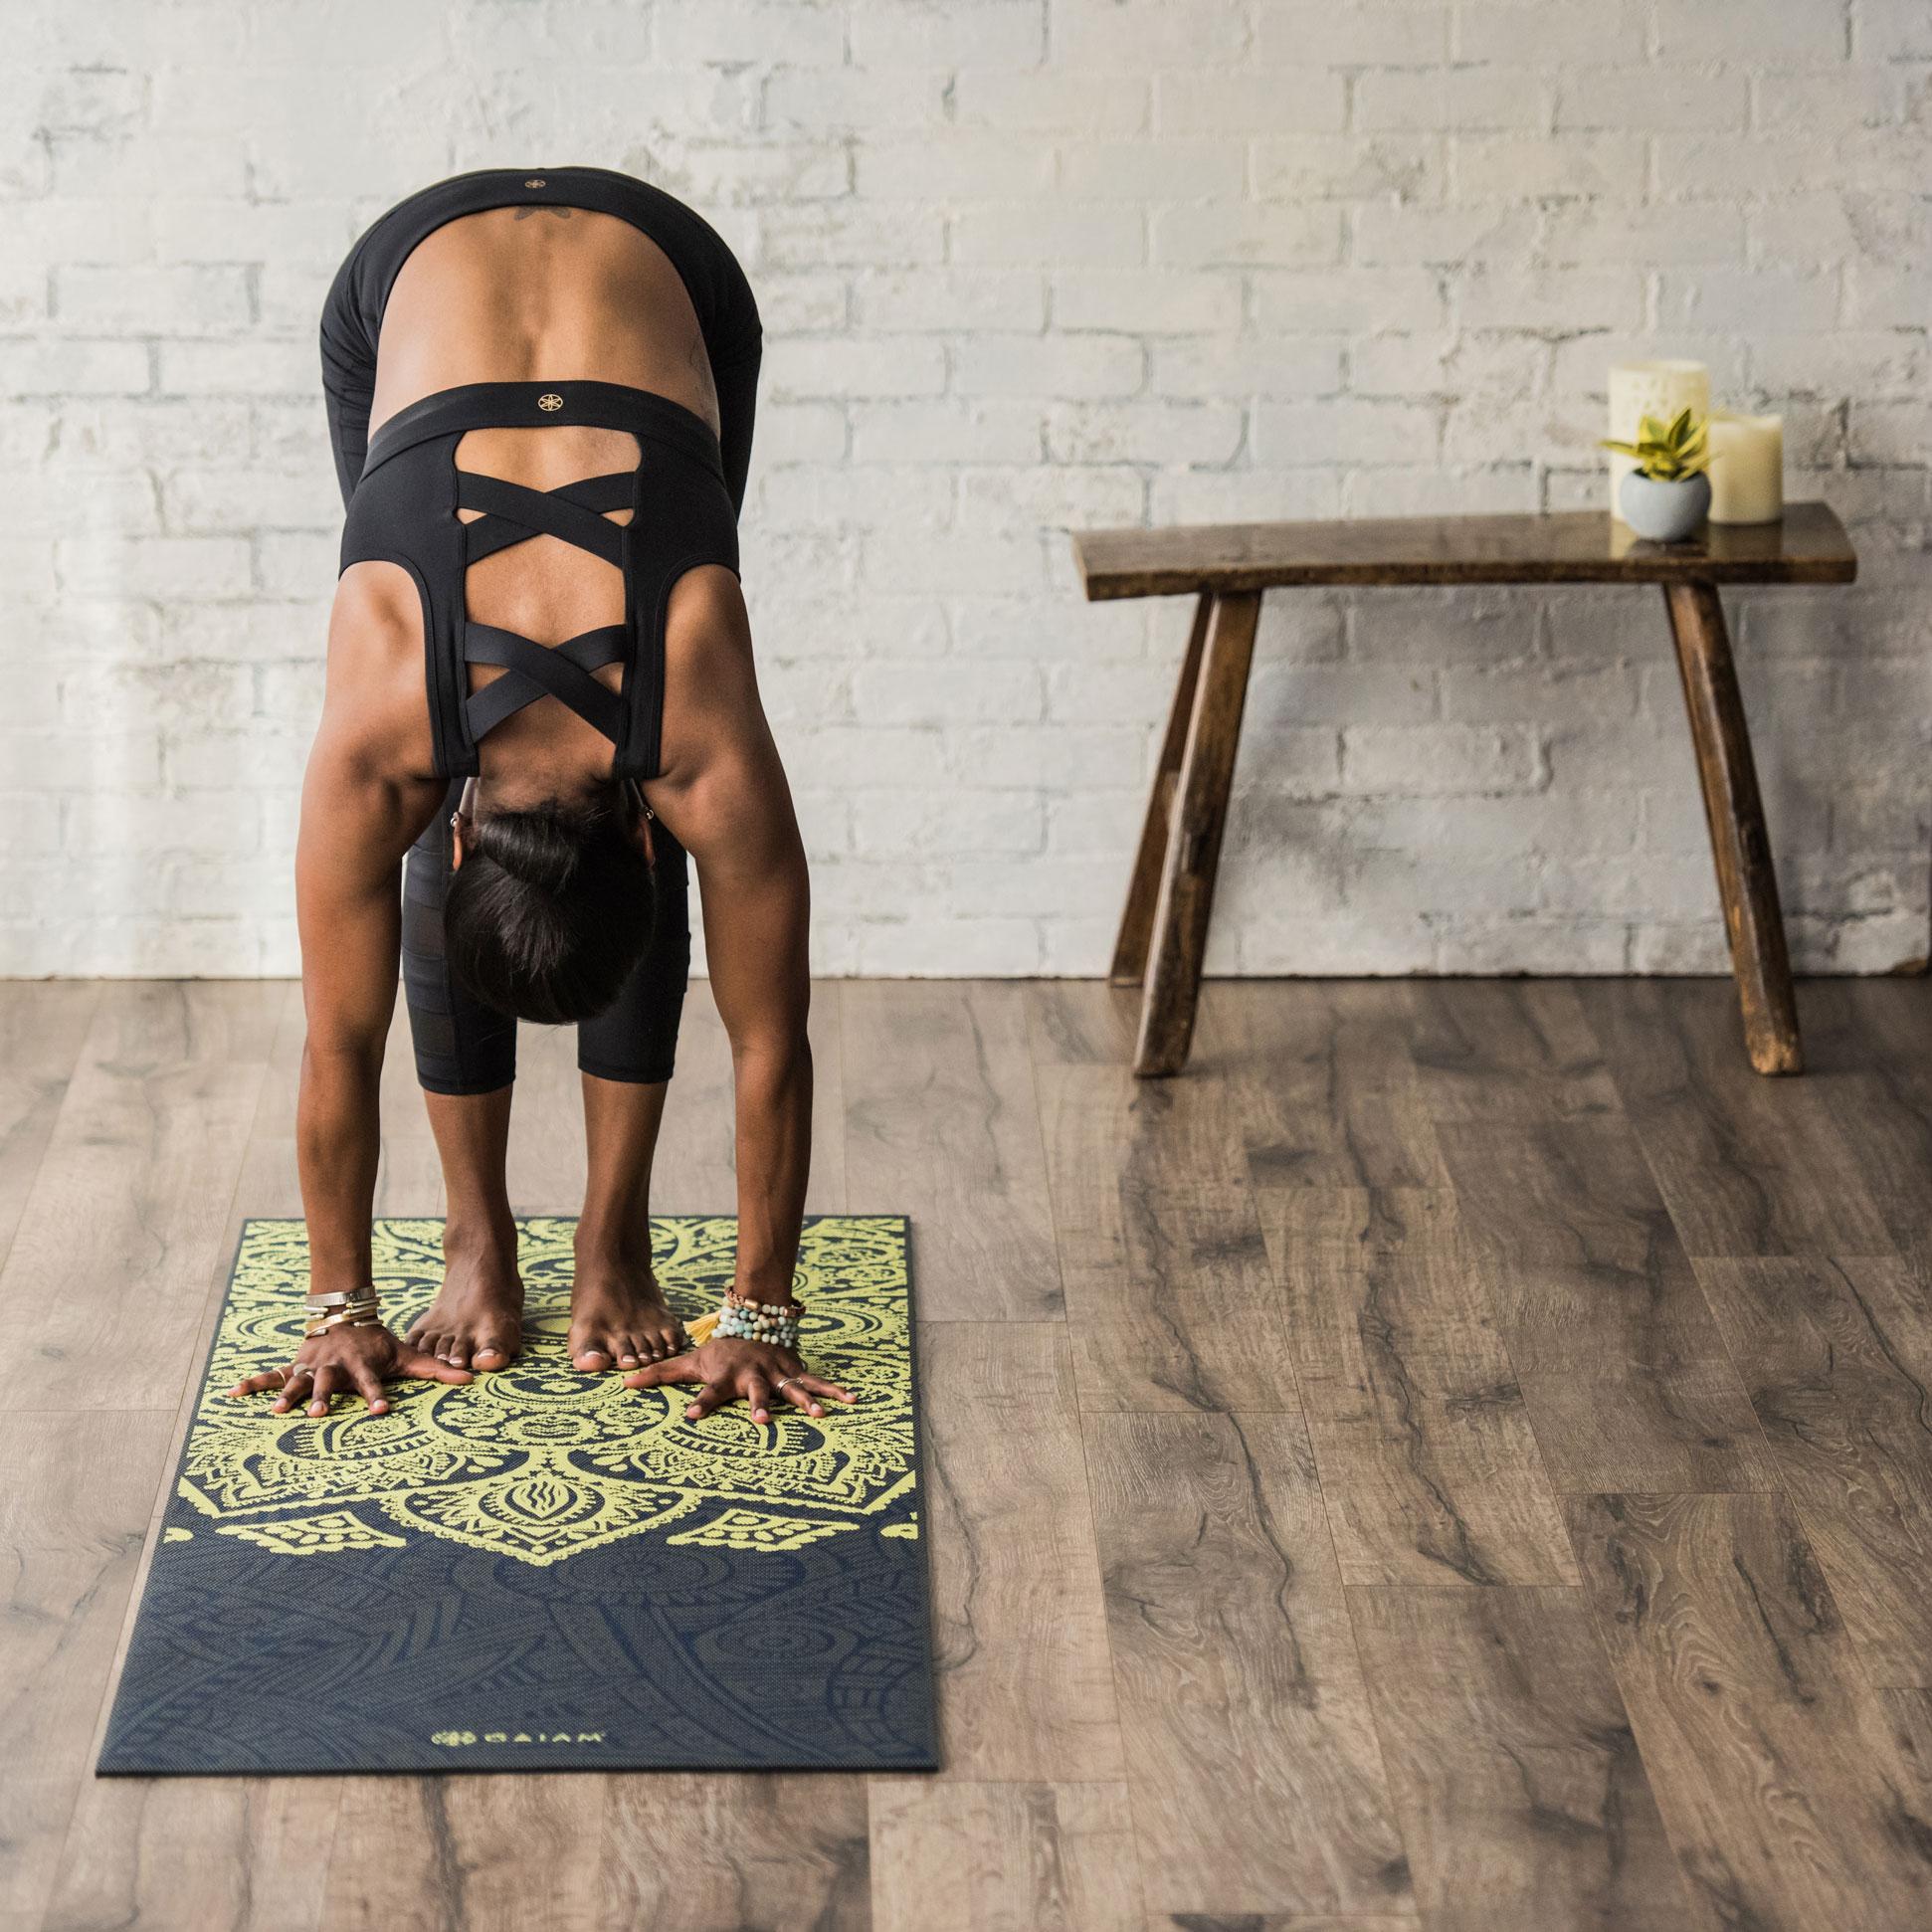 Amazon.com : Gaiam Print Premium Yoga Mats : Sports & Outdoors